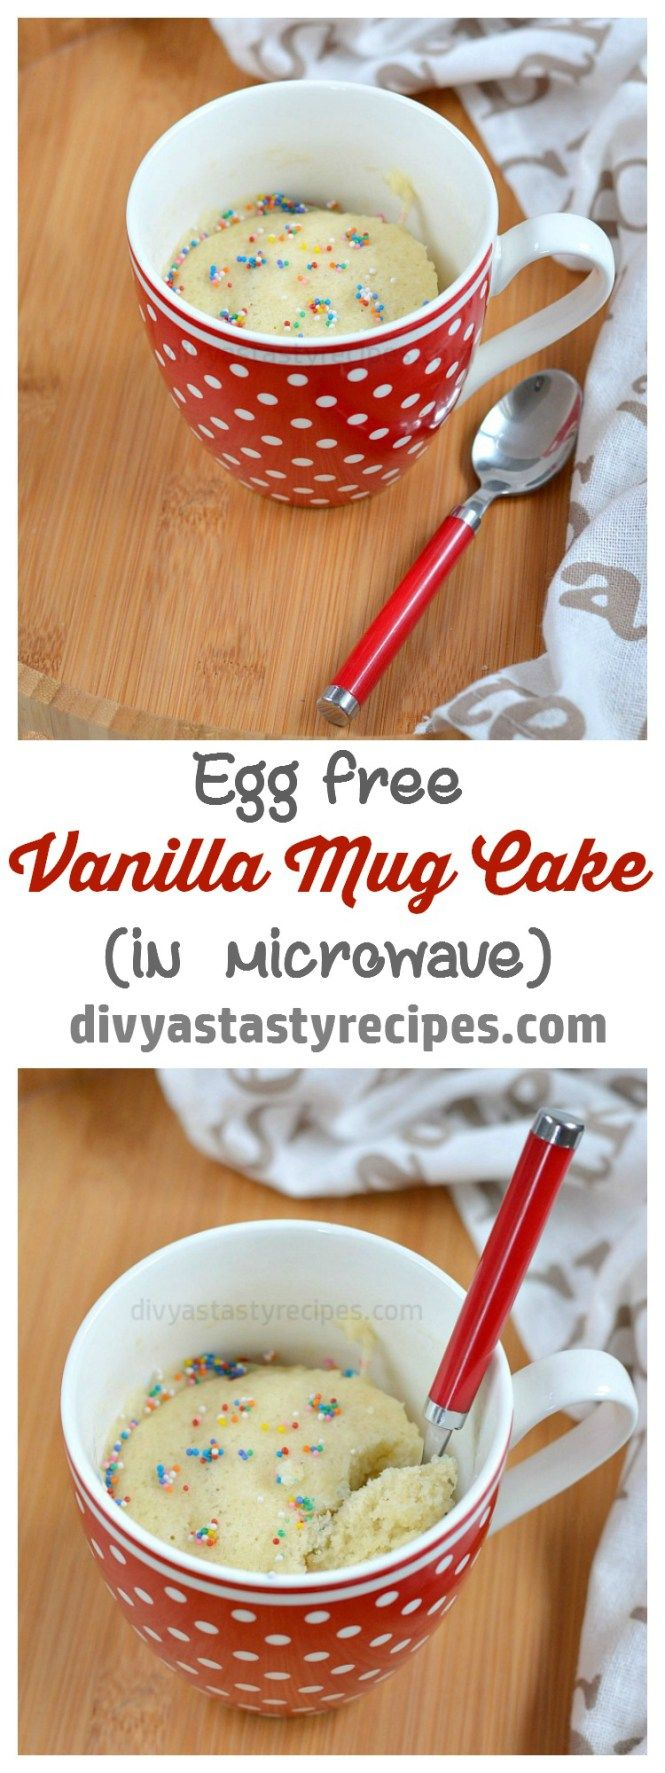 vanilla mug cake, egg free vanilla mug cake in microwave